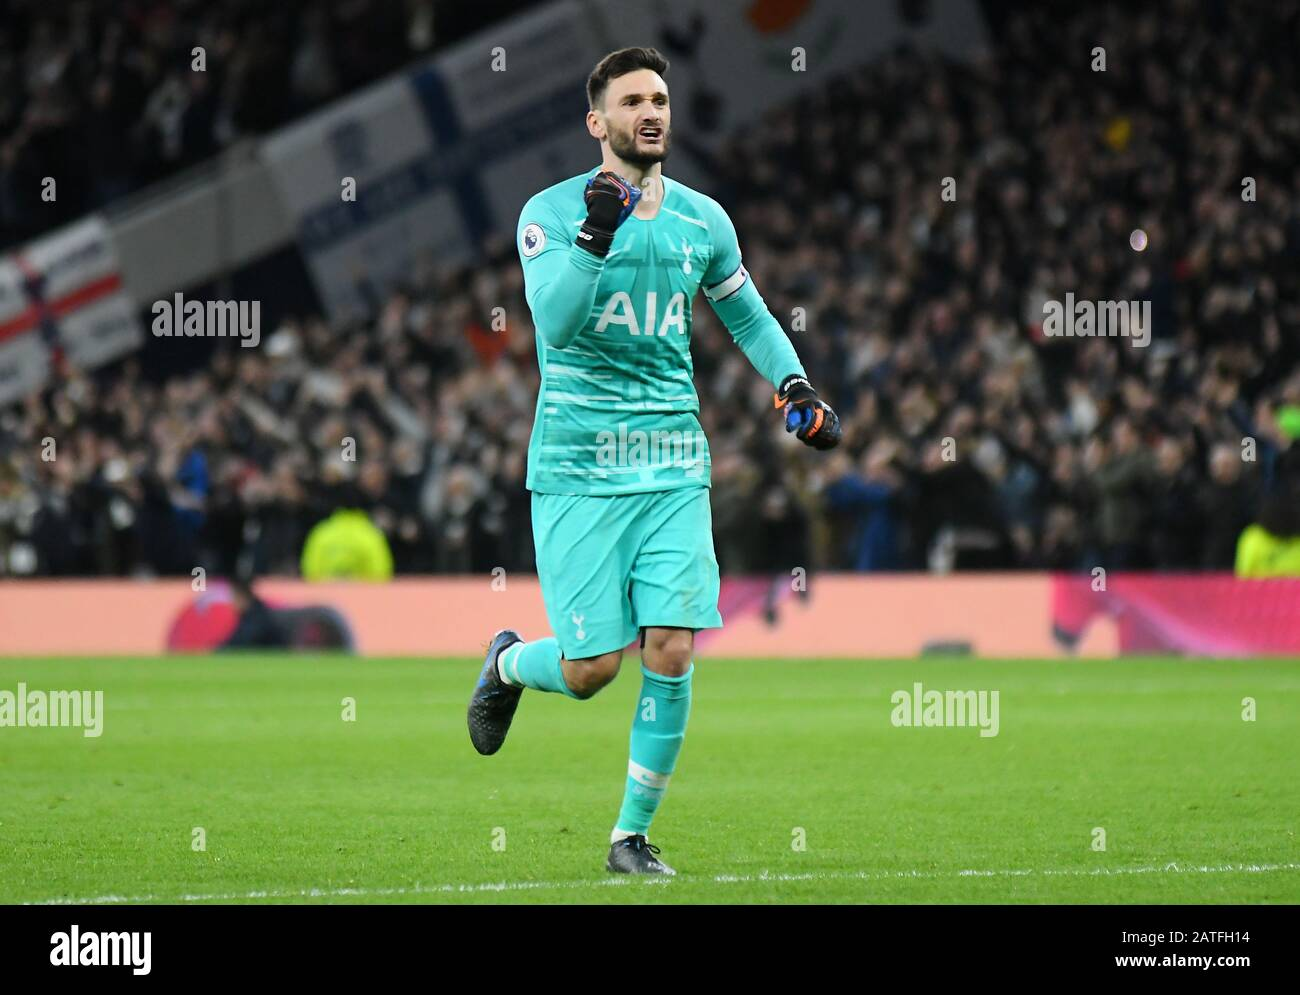 London England February 2 2020 Hugo Lloris Of Tottenham Celebrates After A Goal Scored By His